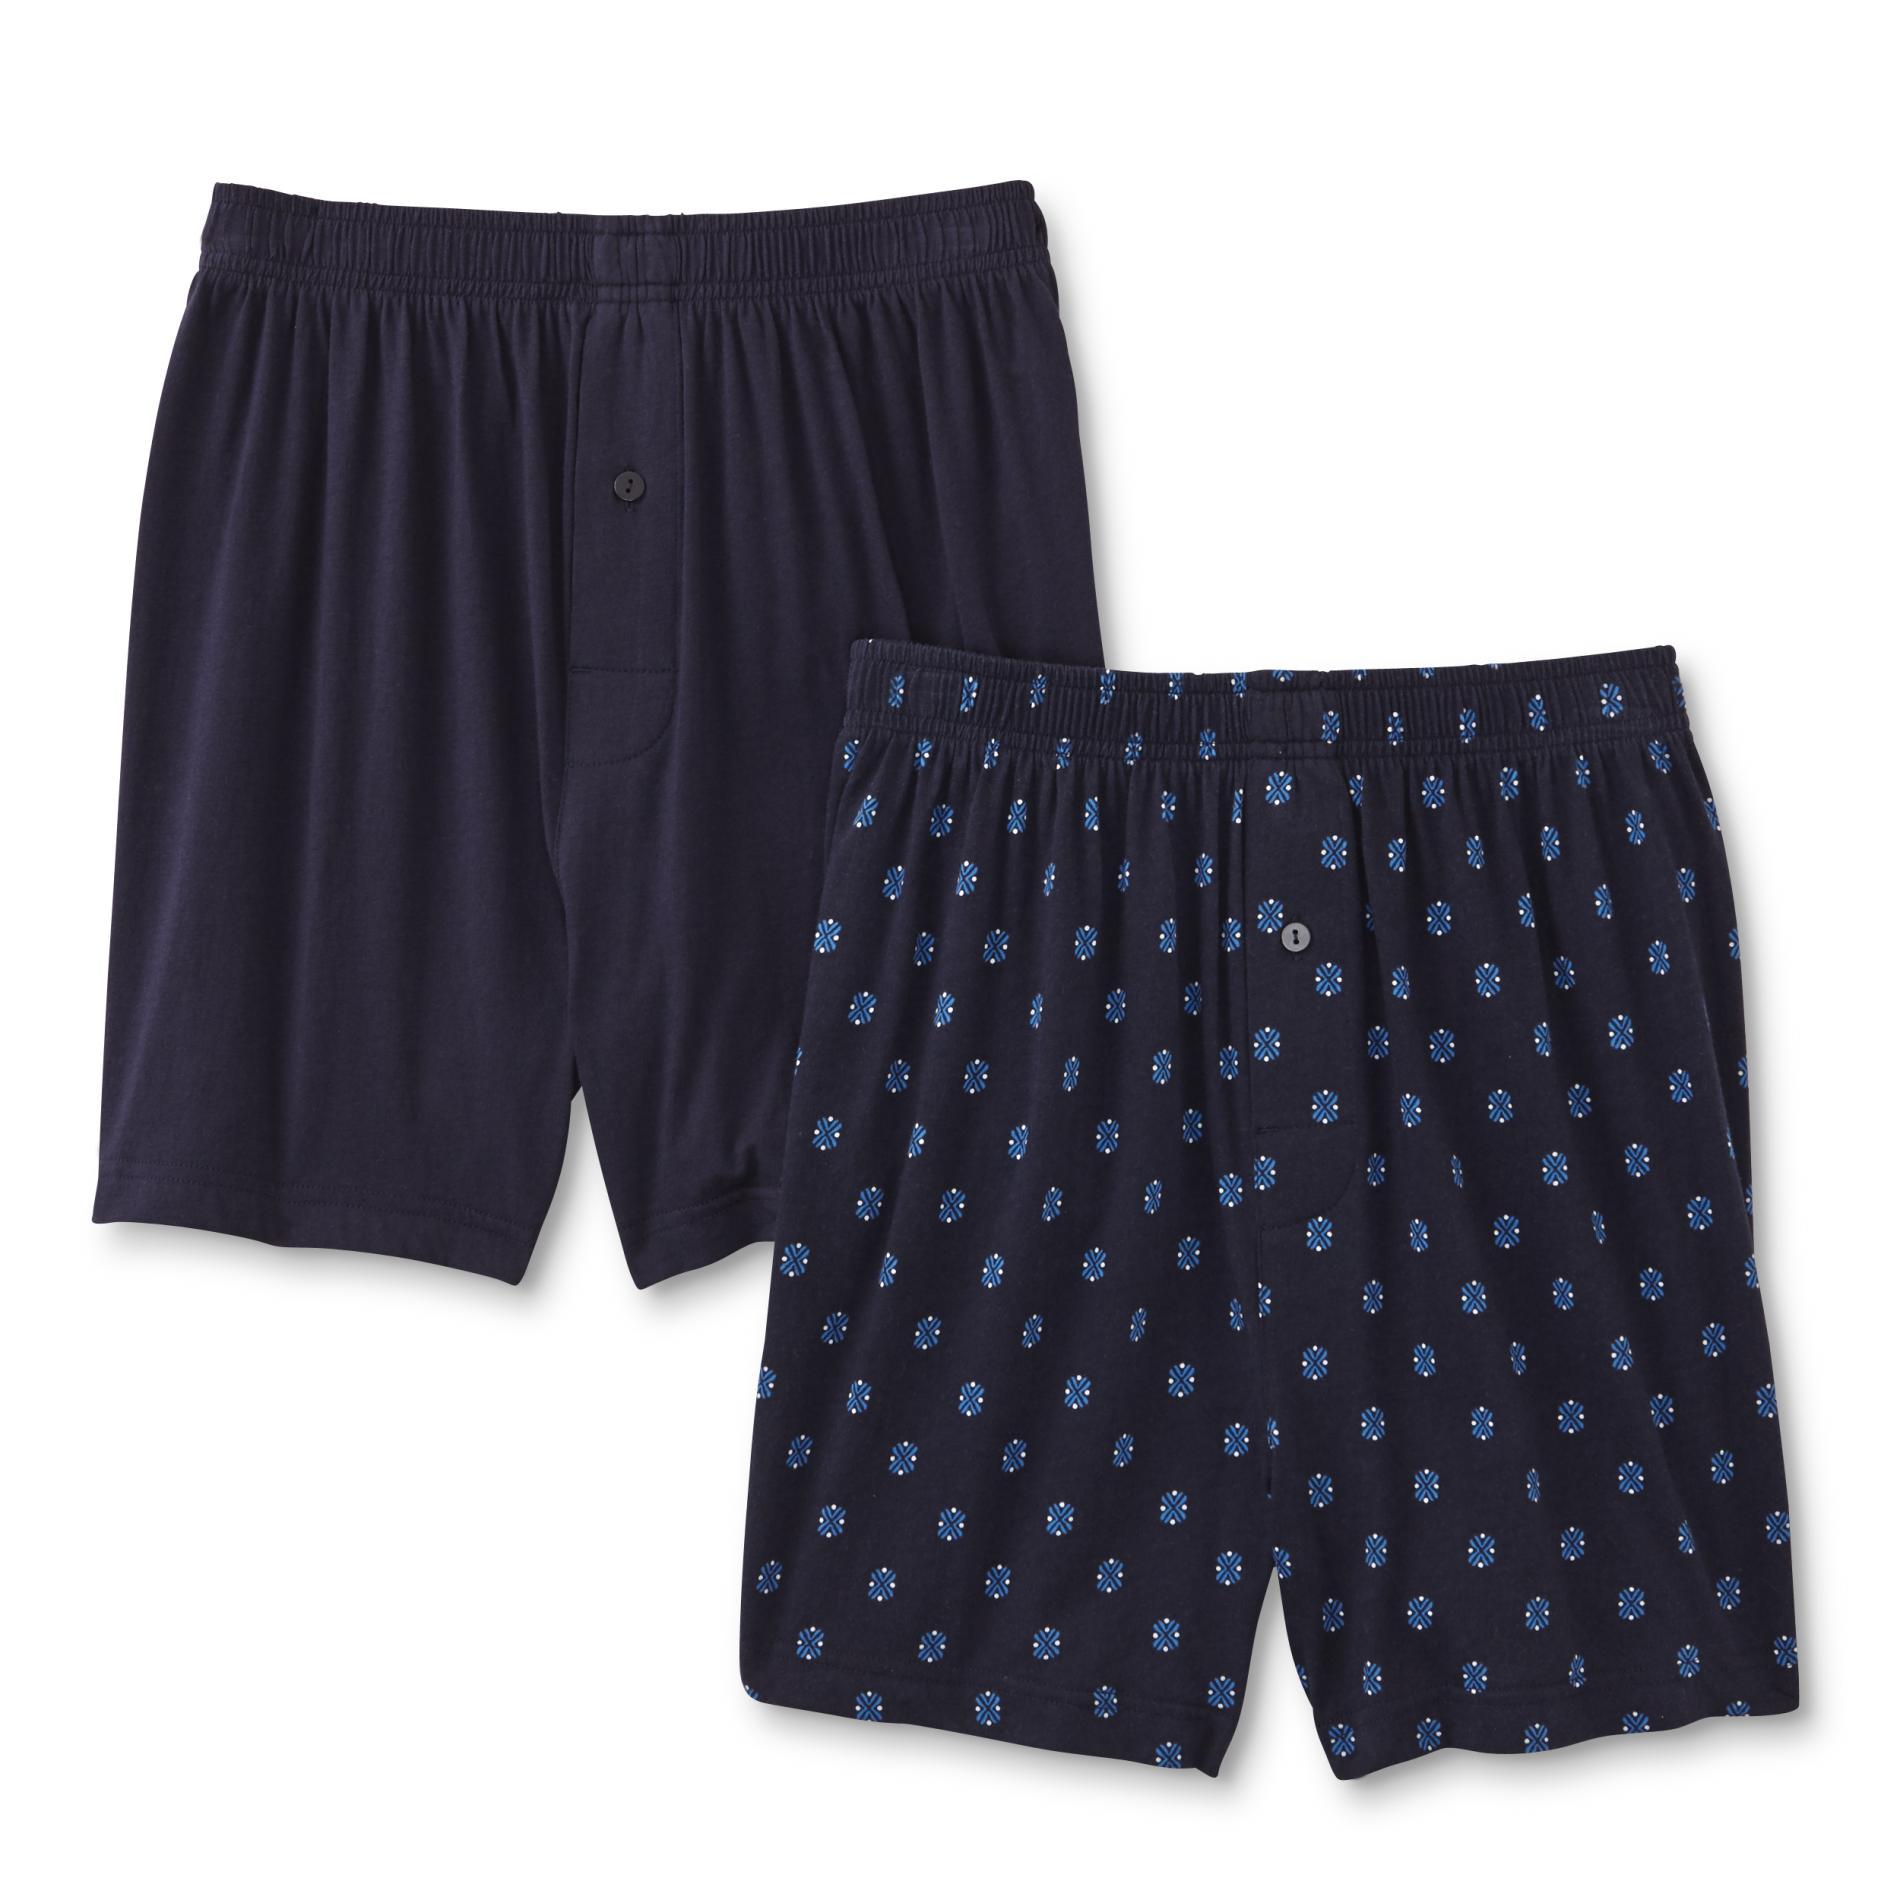 Joe Boxer Men's 2-Pairs Knit Boxer Shorts - Geomteric & Solid